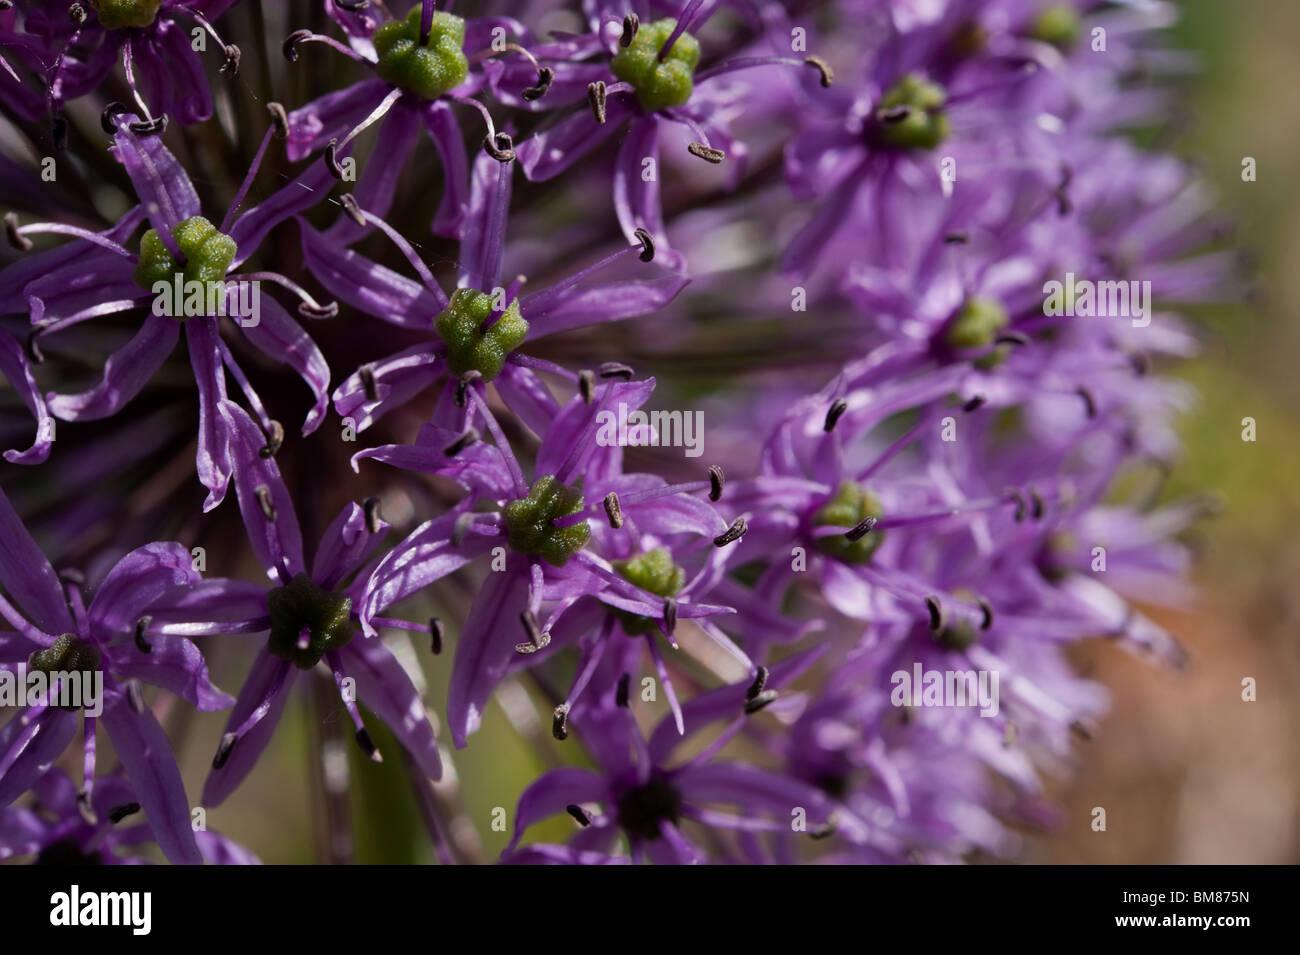 Detail of a purple ornamental allium (a member of the onion family), Allium cristophii. Stock Photo